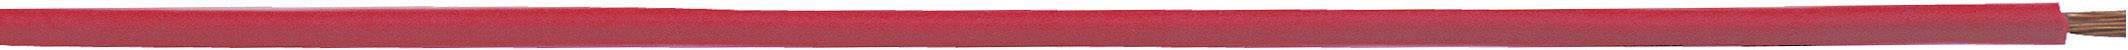 Opletenie / lanko LappKabel 4510031S H05V-K, 1 x 0.50 mm², vonkajší Ø 2.50 mm, 250 m, hnedá